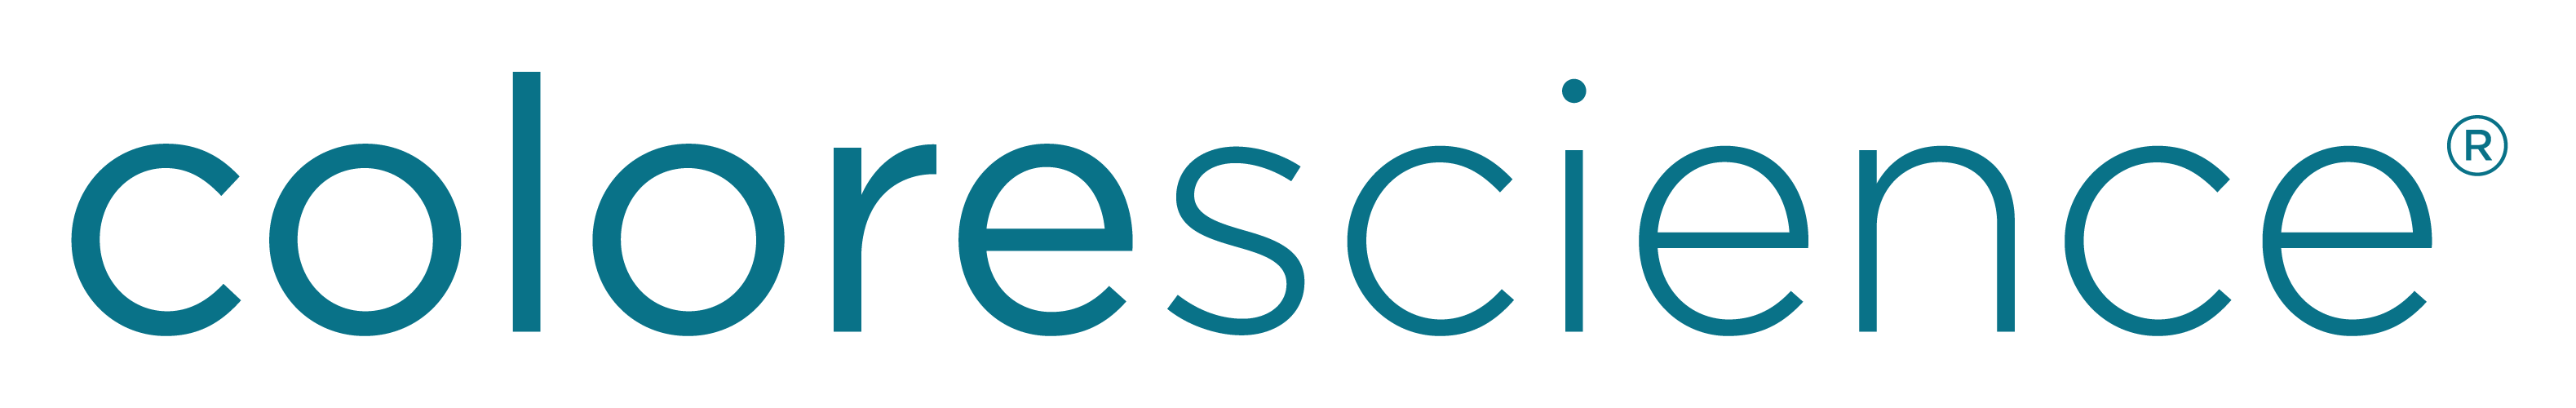 Dermal Laser Centres- Colorescience Logo-41K